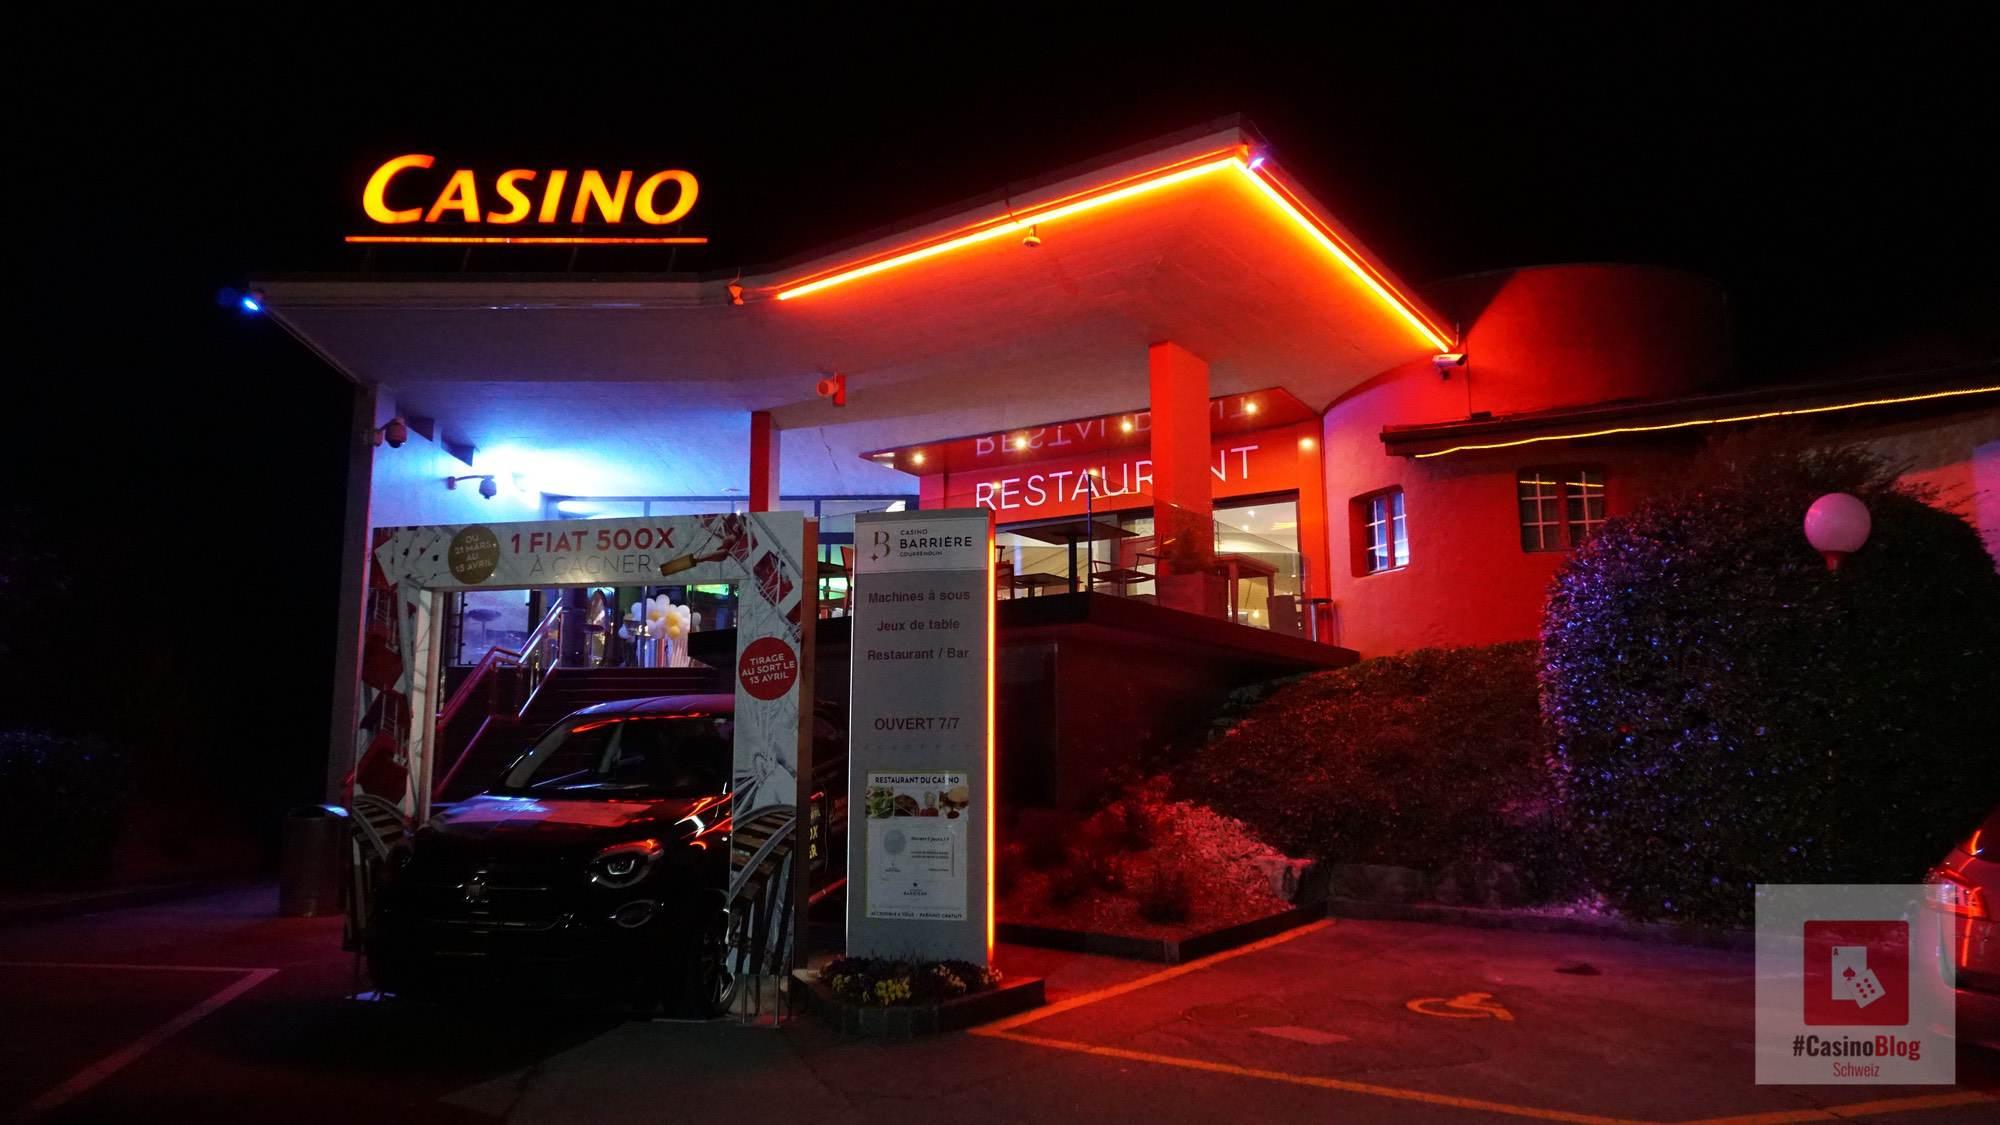 Casino Jura